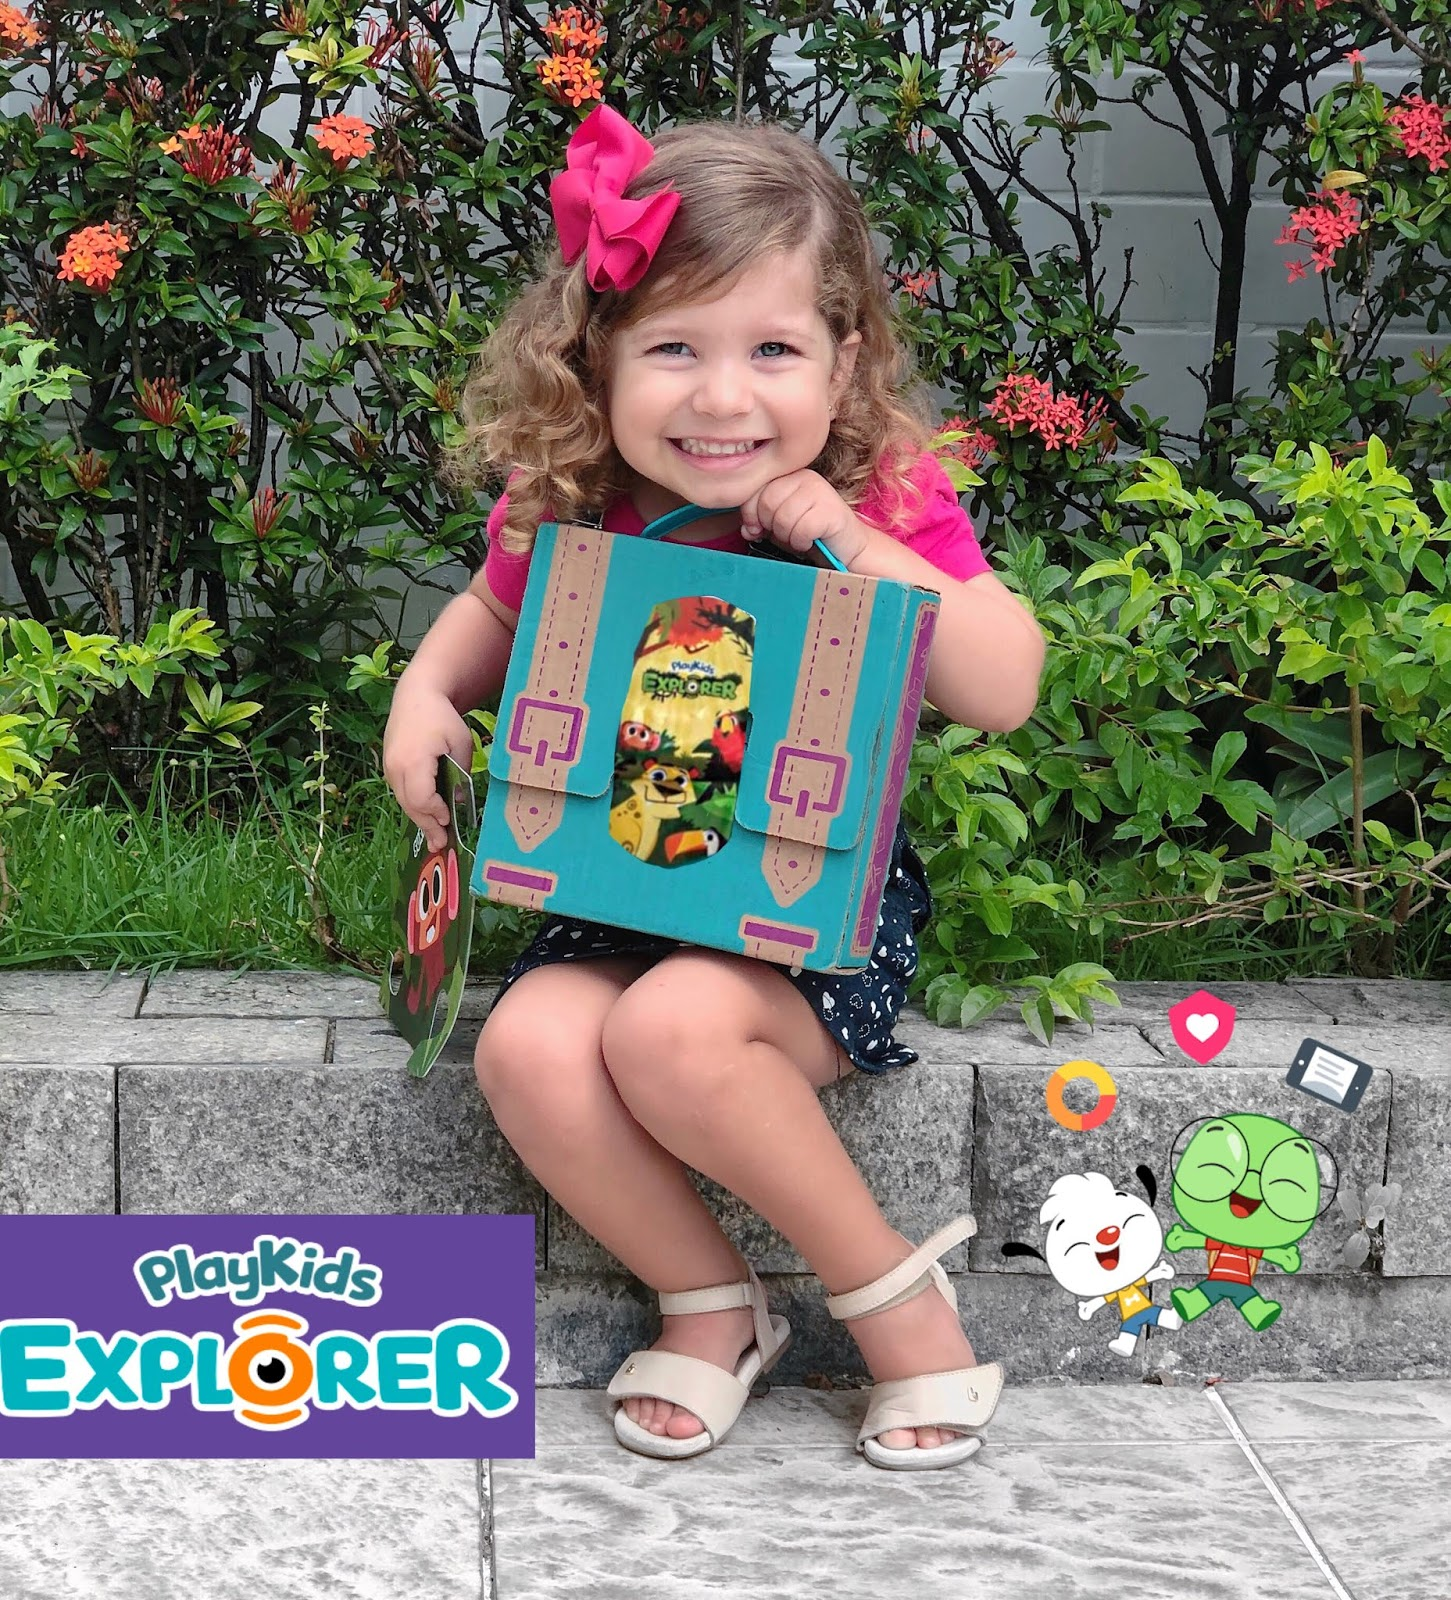 Play Kids Explorer